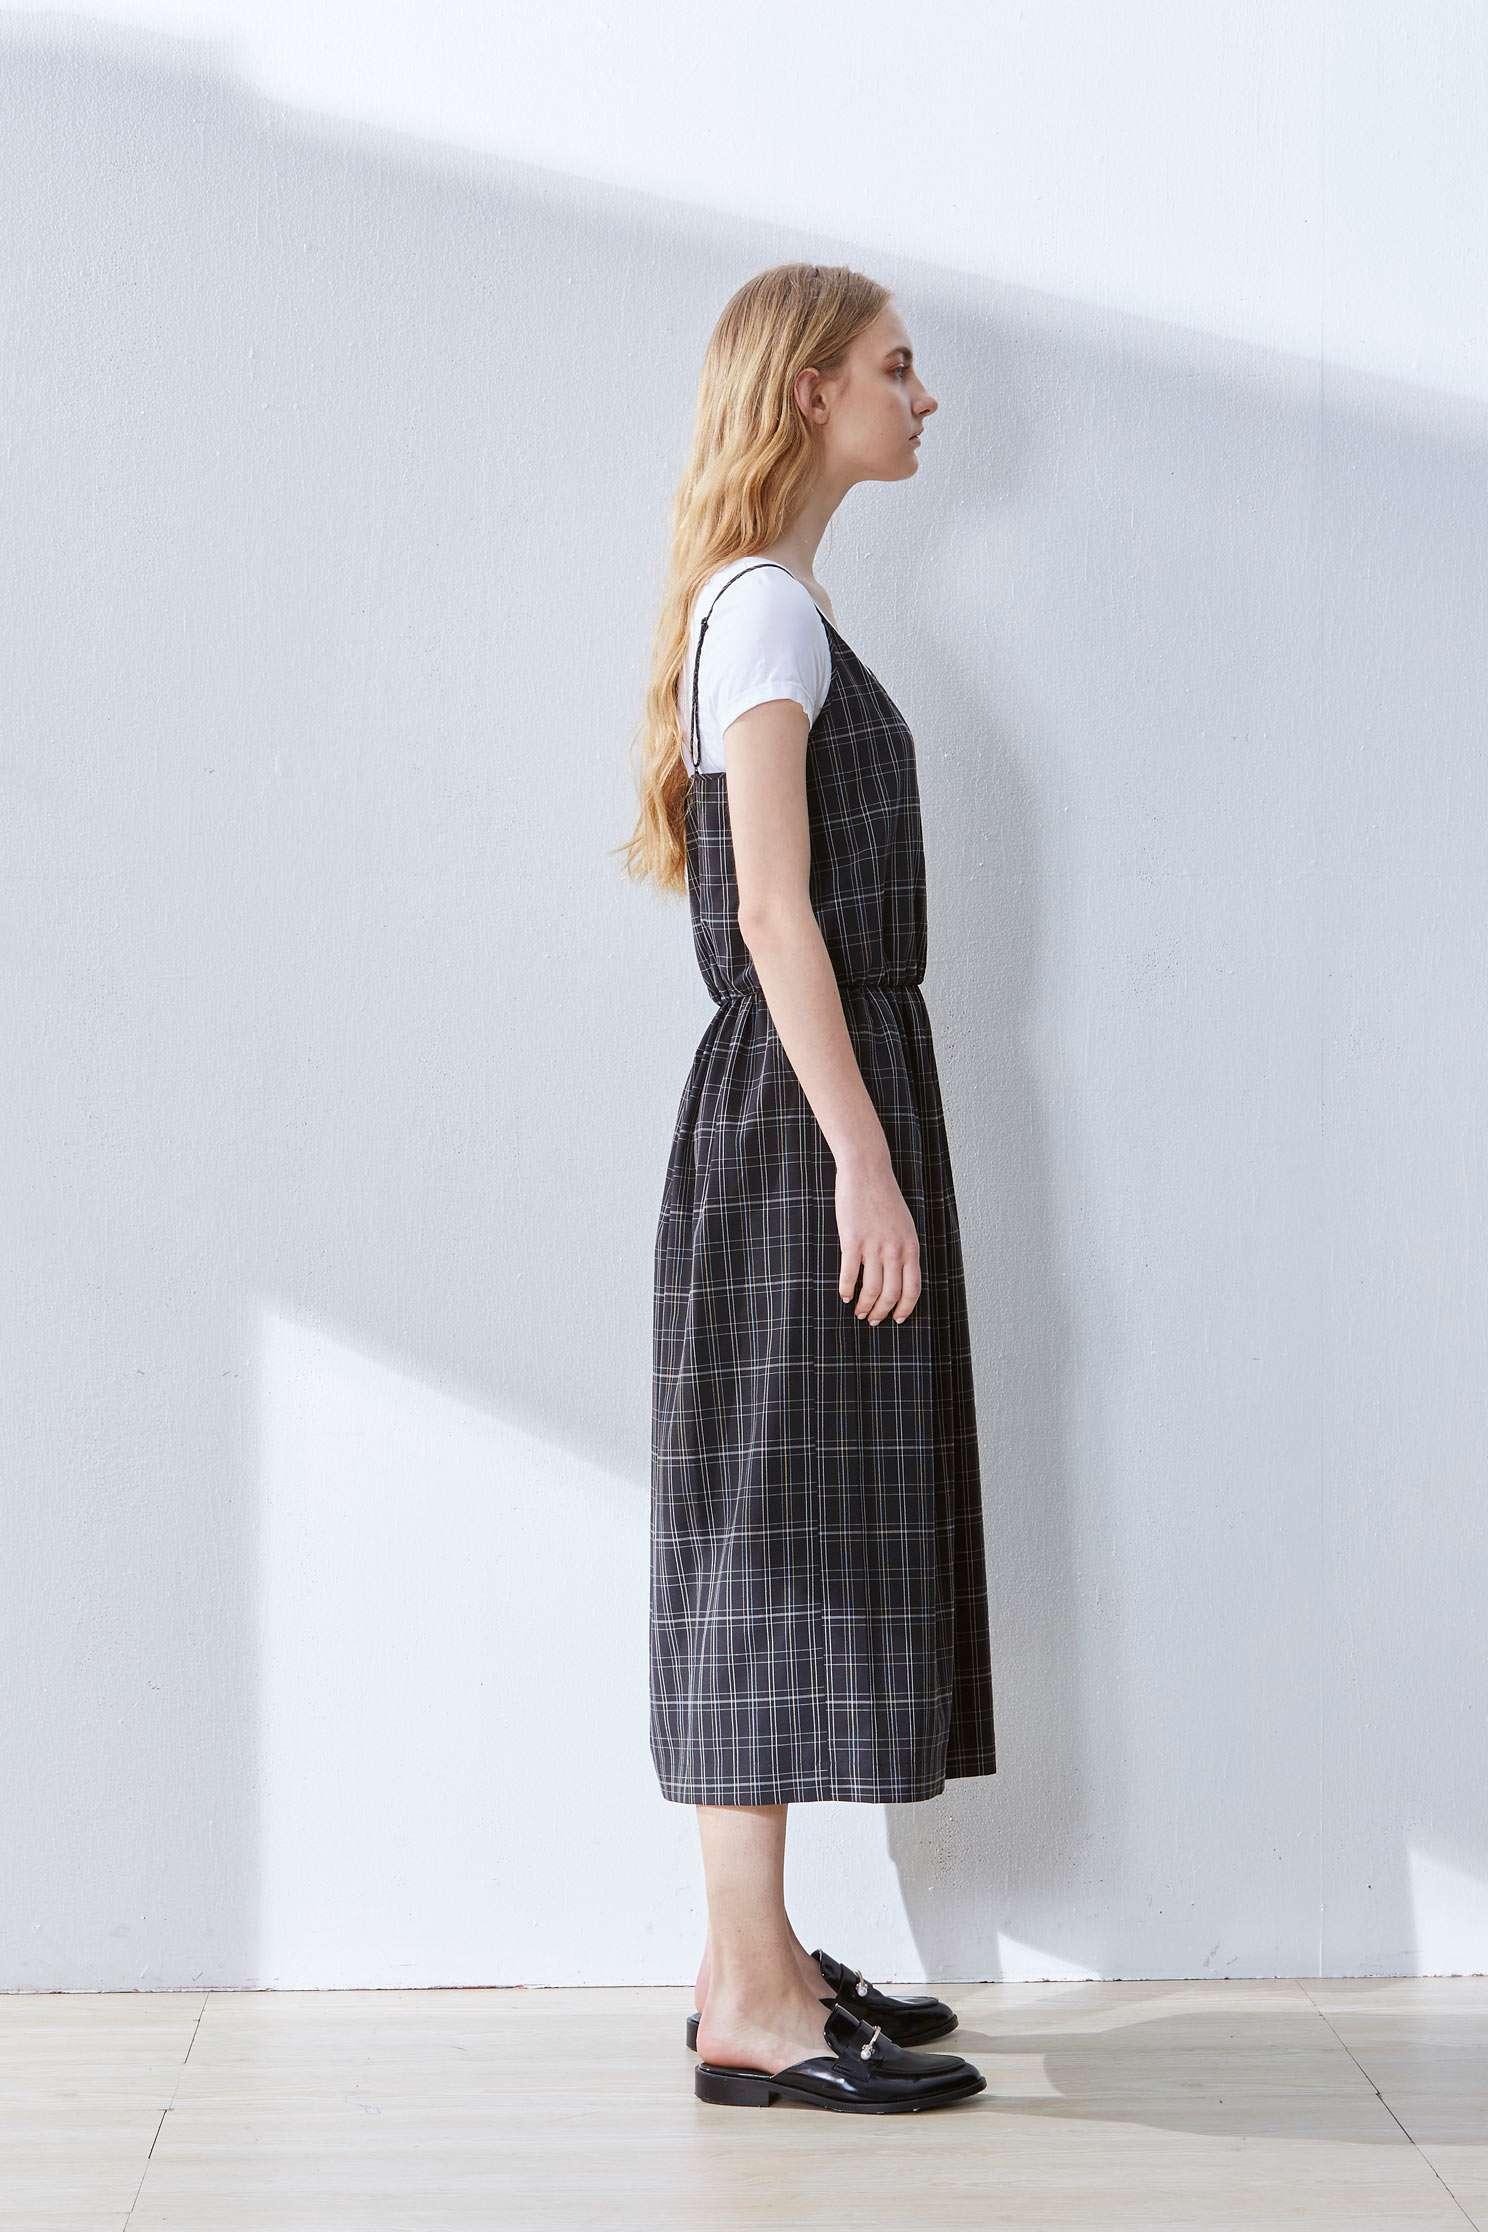 Plaid classic dress,t-shirt,casualdress,shortsleevedress,spaghettistrapdress,longdress